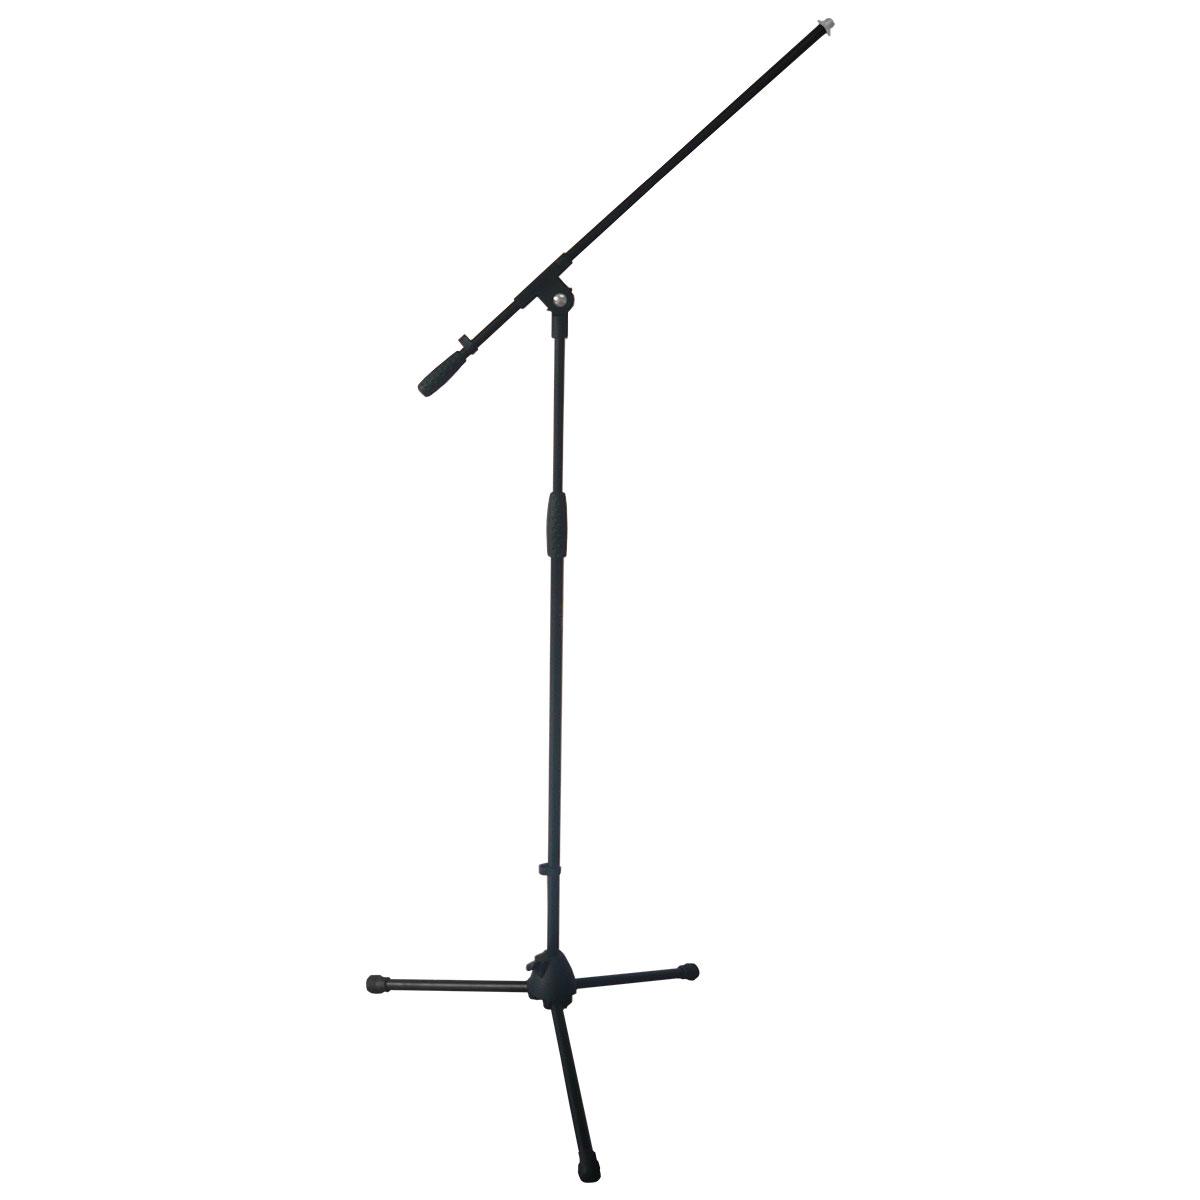 Pedestal p/ Microfone tipo Girafa - 116 TBS